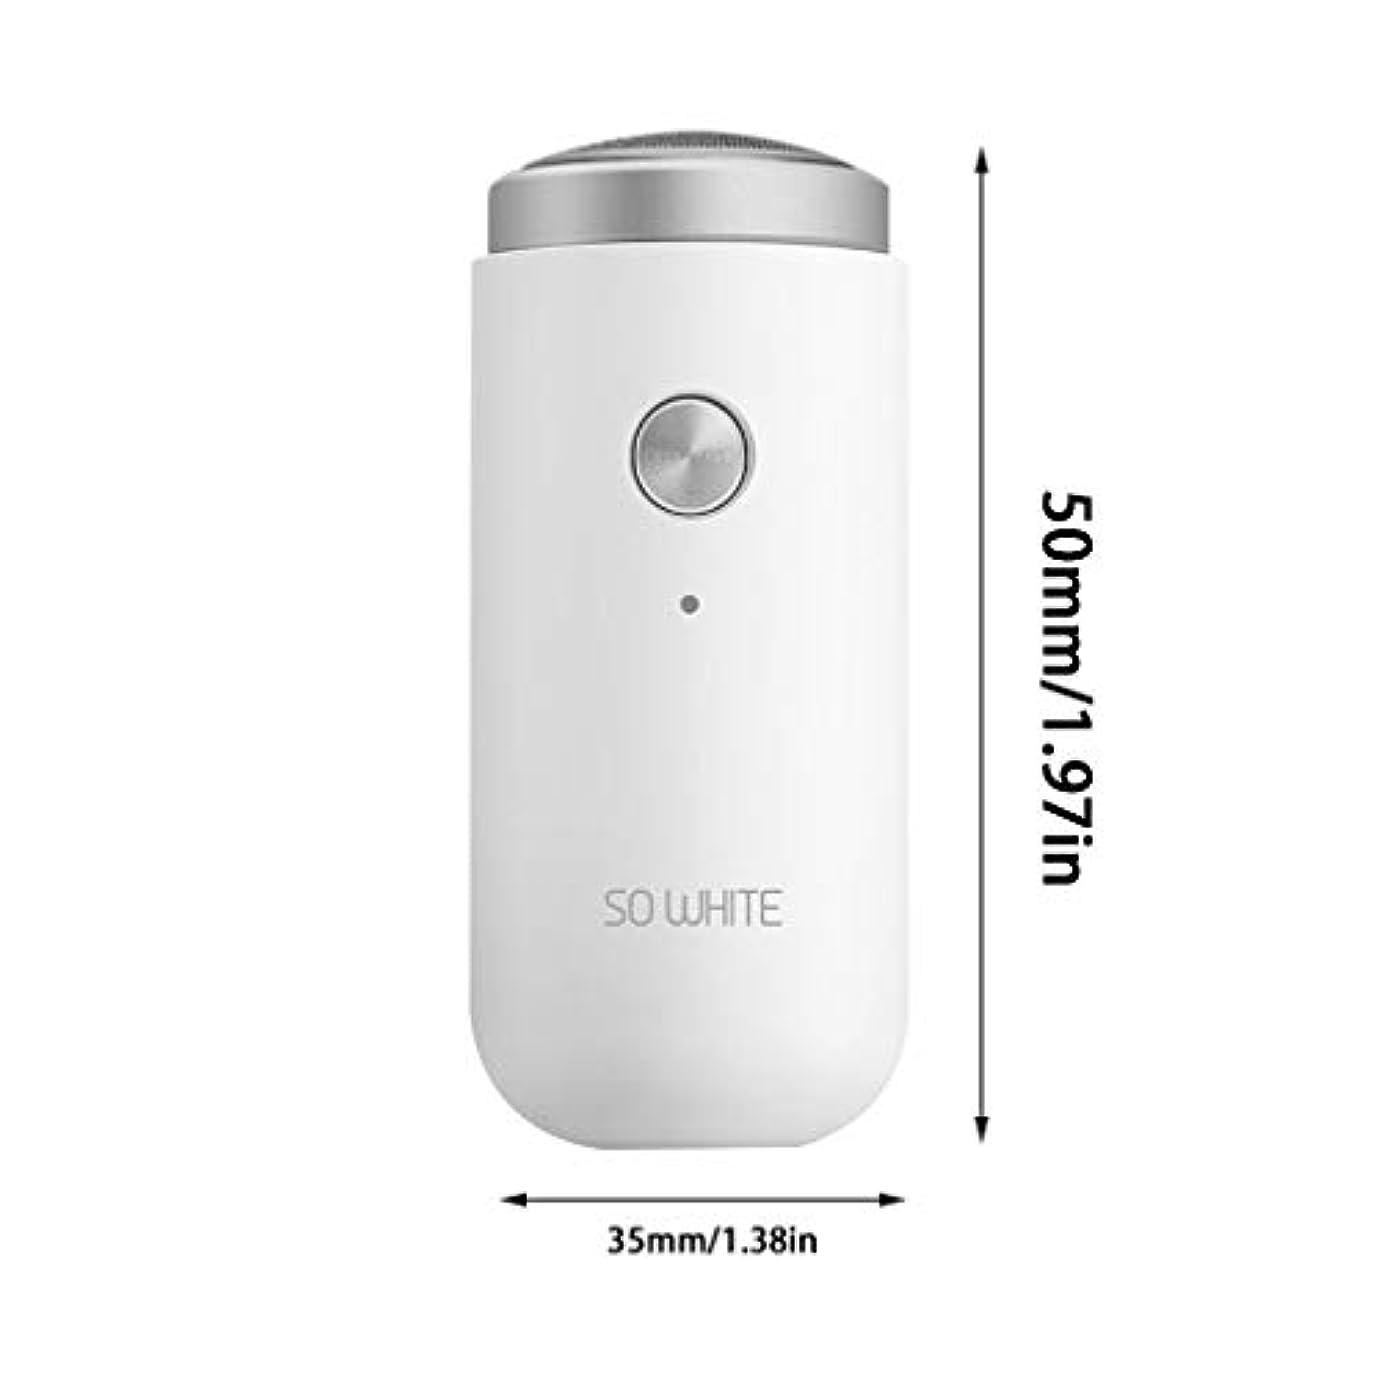 SO WHITEミニ電気シェービングUSB電気シェーバー充電式カミソリ